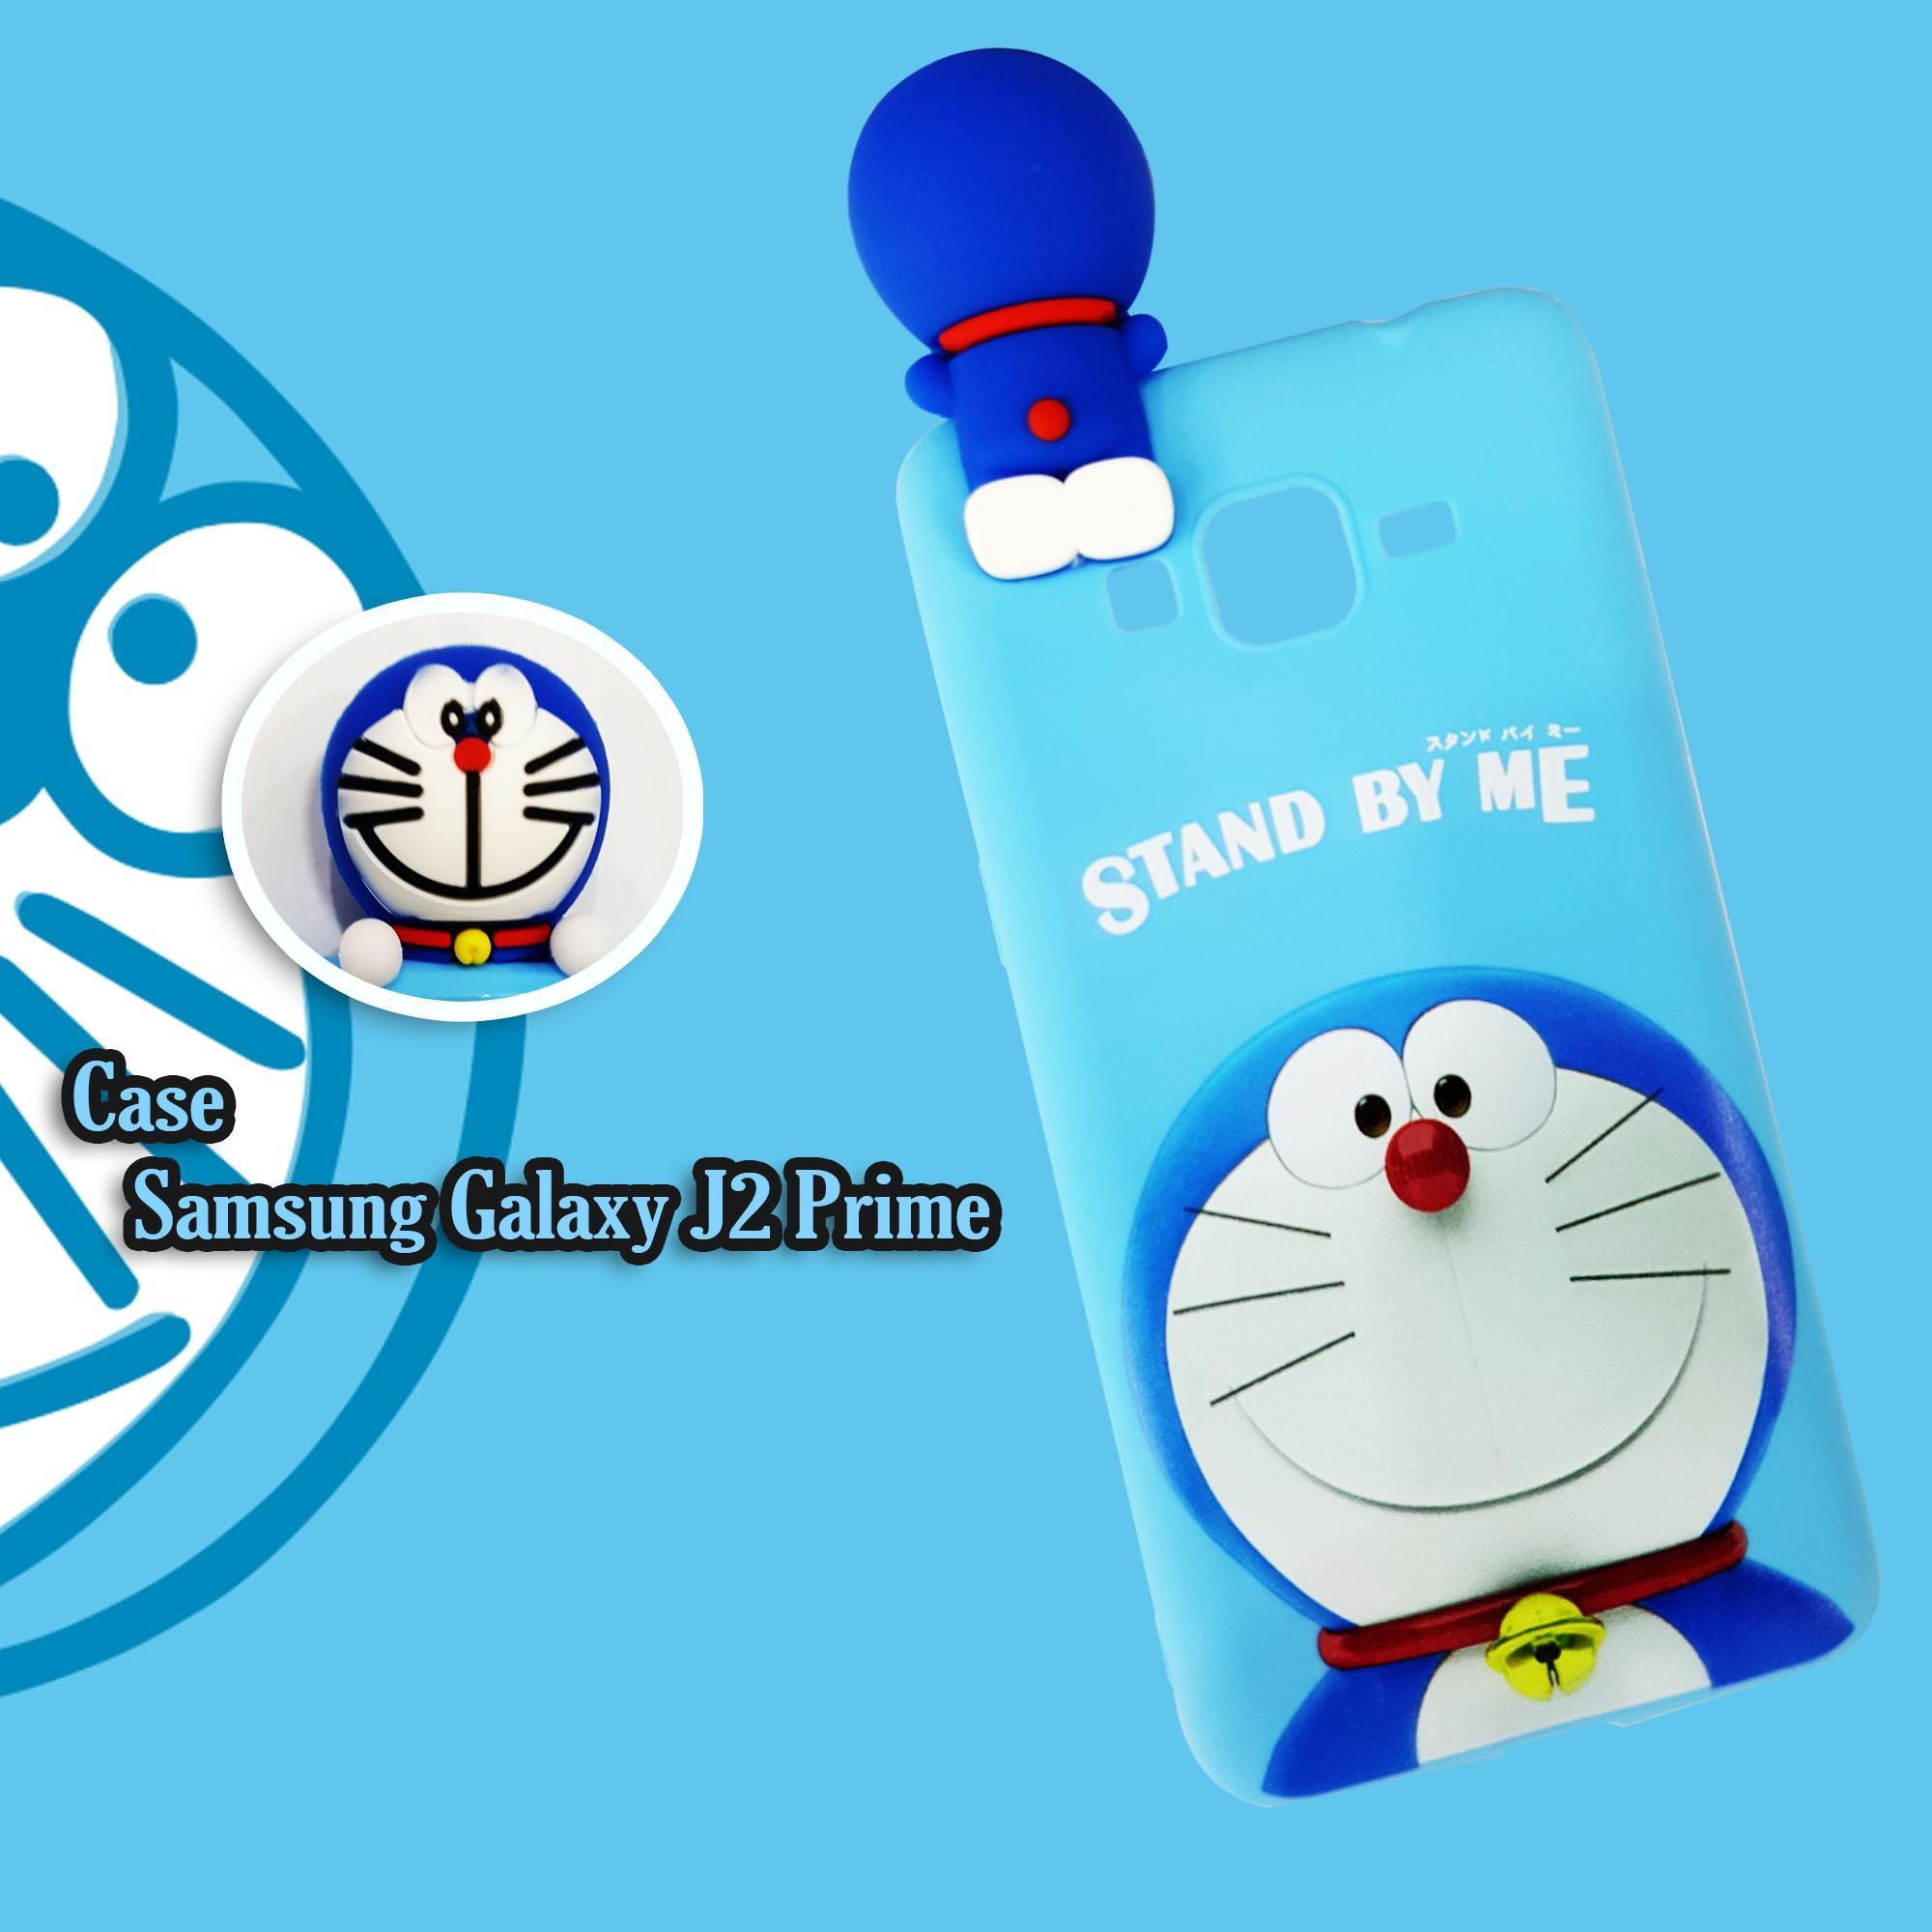 Kehebatan Intristore New Doraemon Fashion Soft Sillicon Phone Case Softcase Silicon 3d Kartun Mungil Lucu Samsung Galaxy J2 Prime Standbye Me For